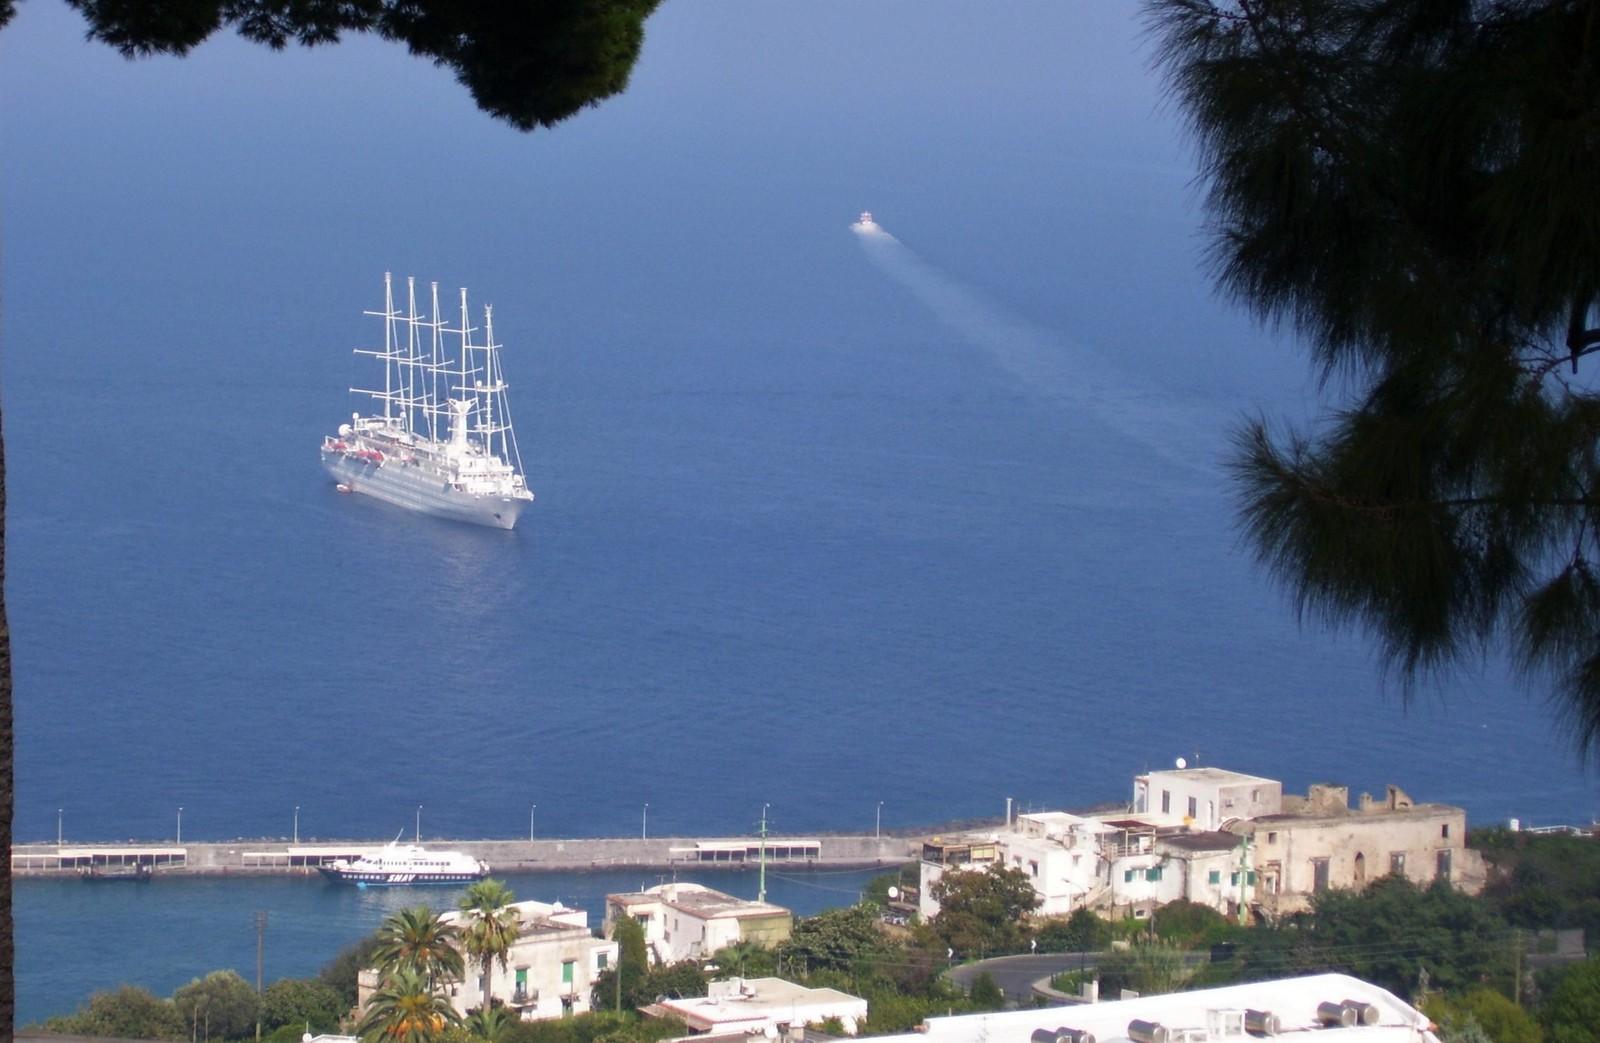 An der Amalfitana - Schiff Club Med 2